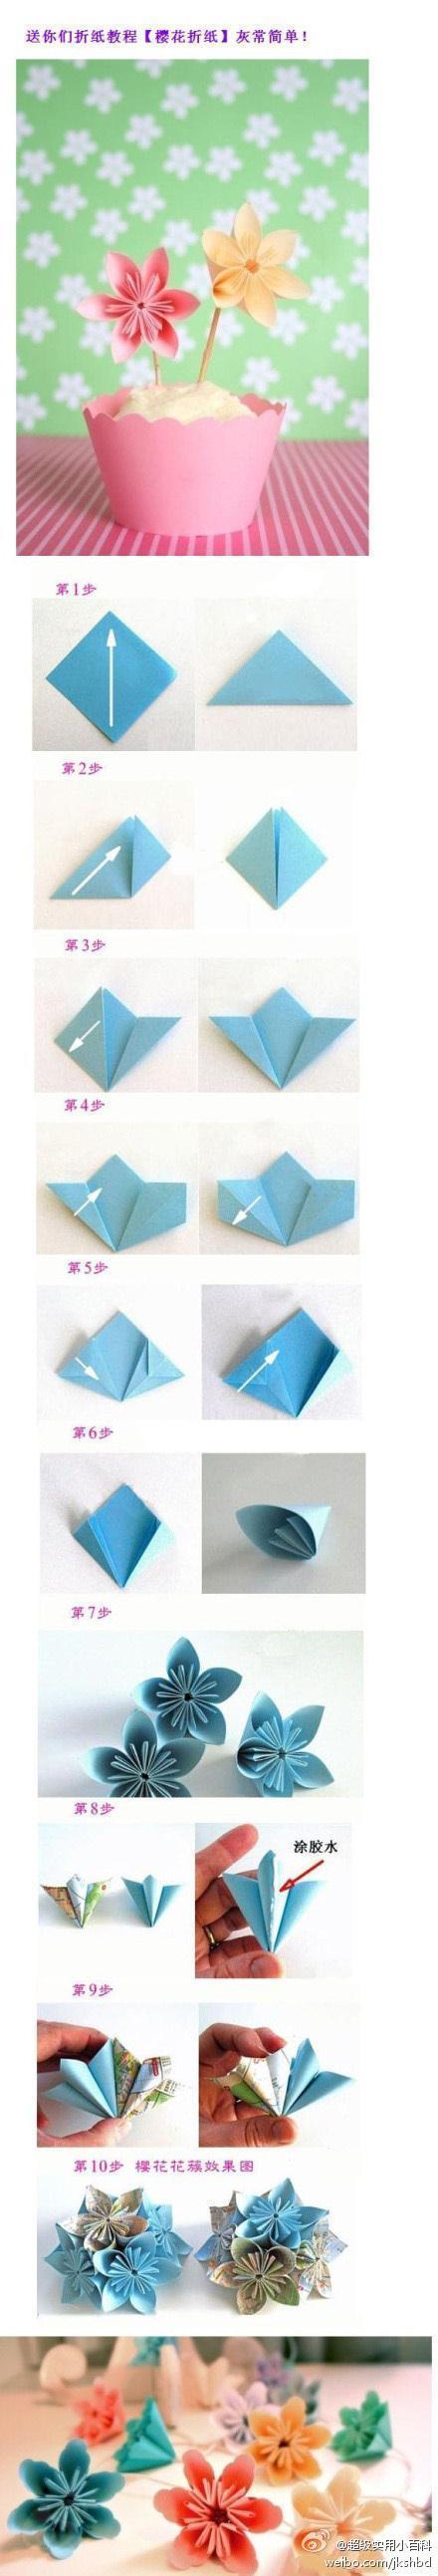 Origami Cherry Blossoms | 2KidslandKrafts - photo#35